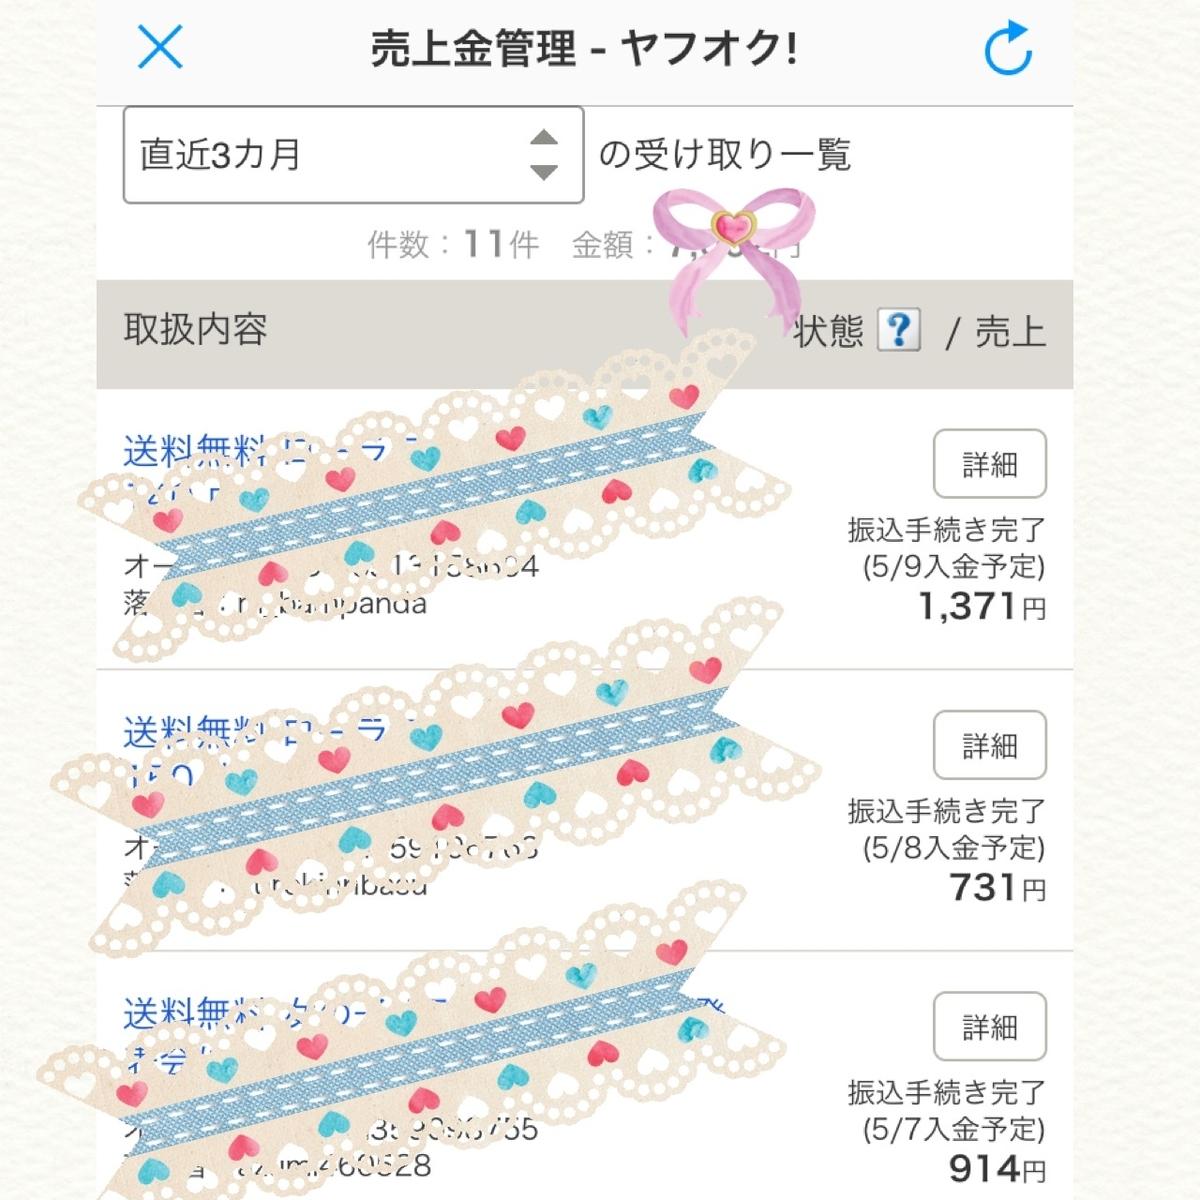 f:id:inoue-0218-yuko:20190426125437j:plain